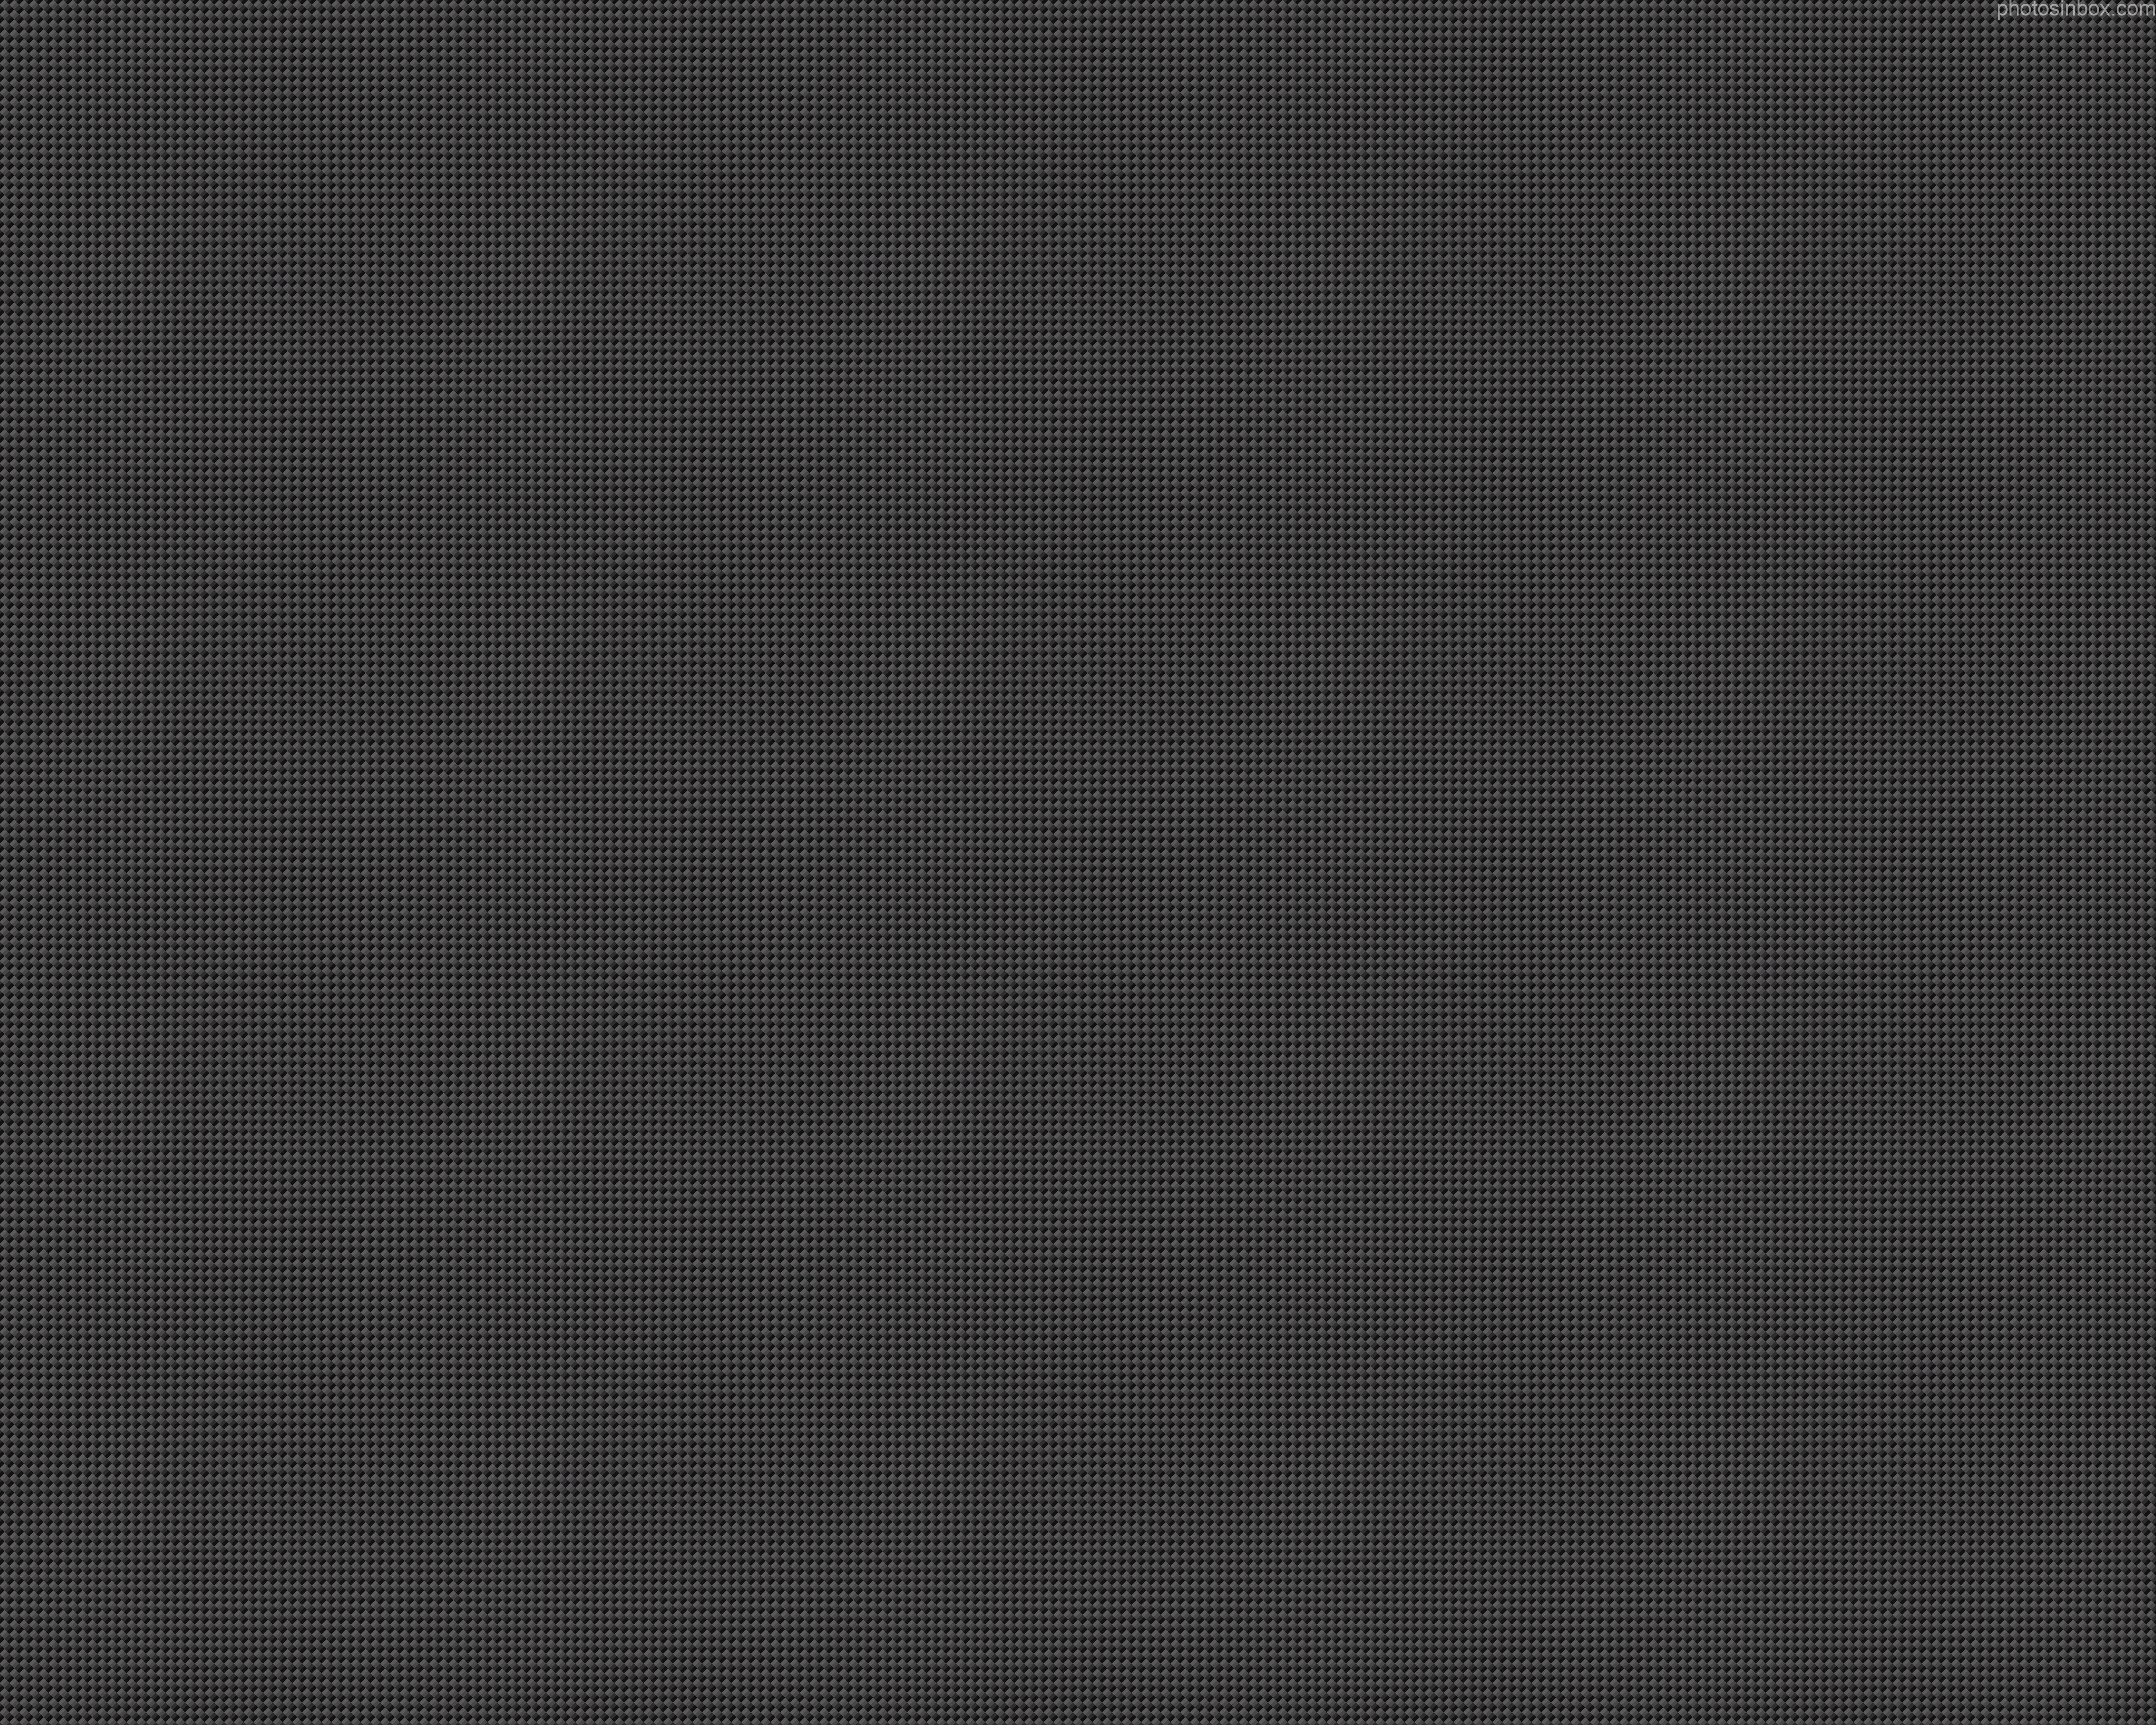 Other Black Carbon Fibre Background Pictures 5000x4000